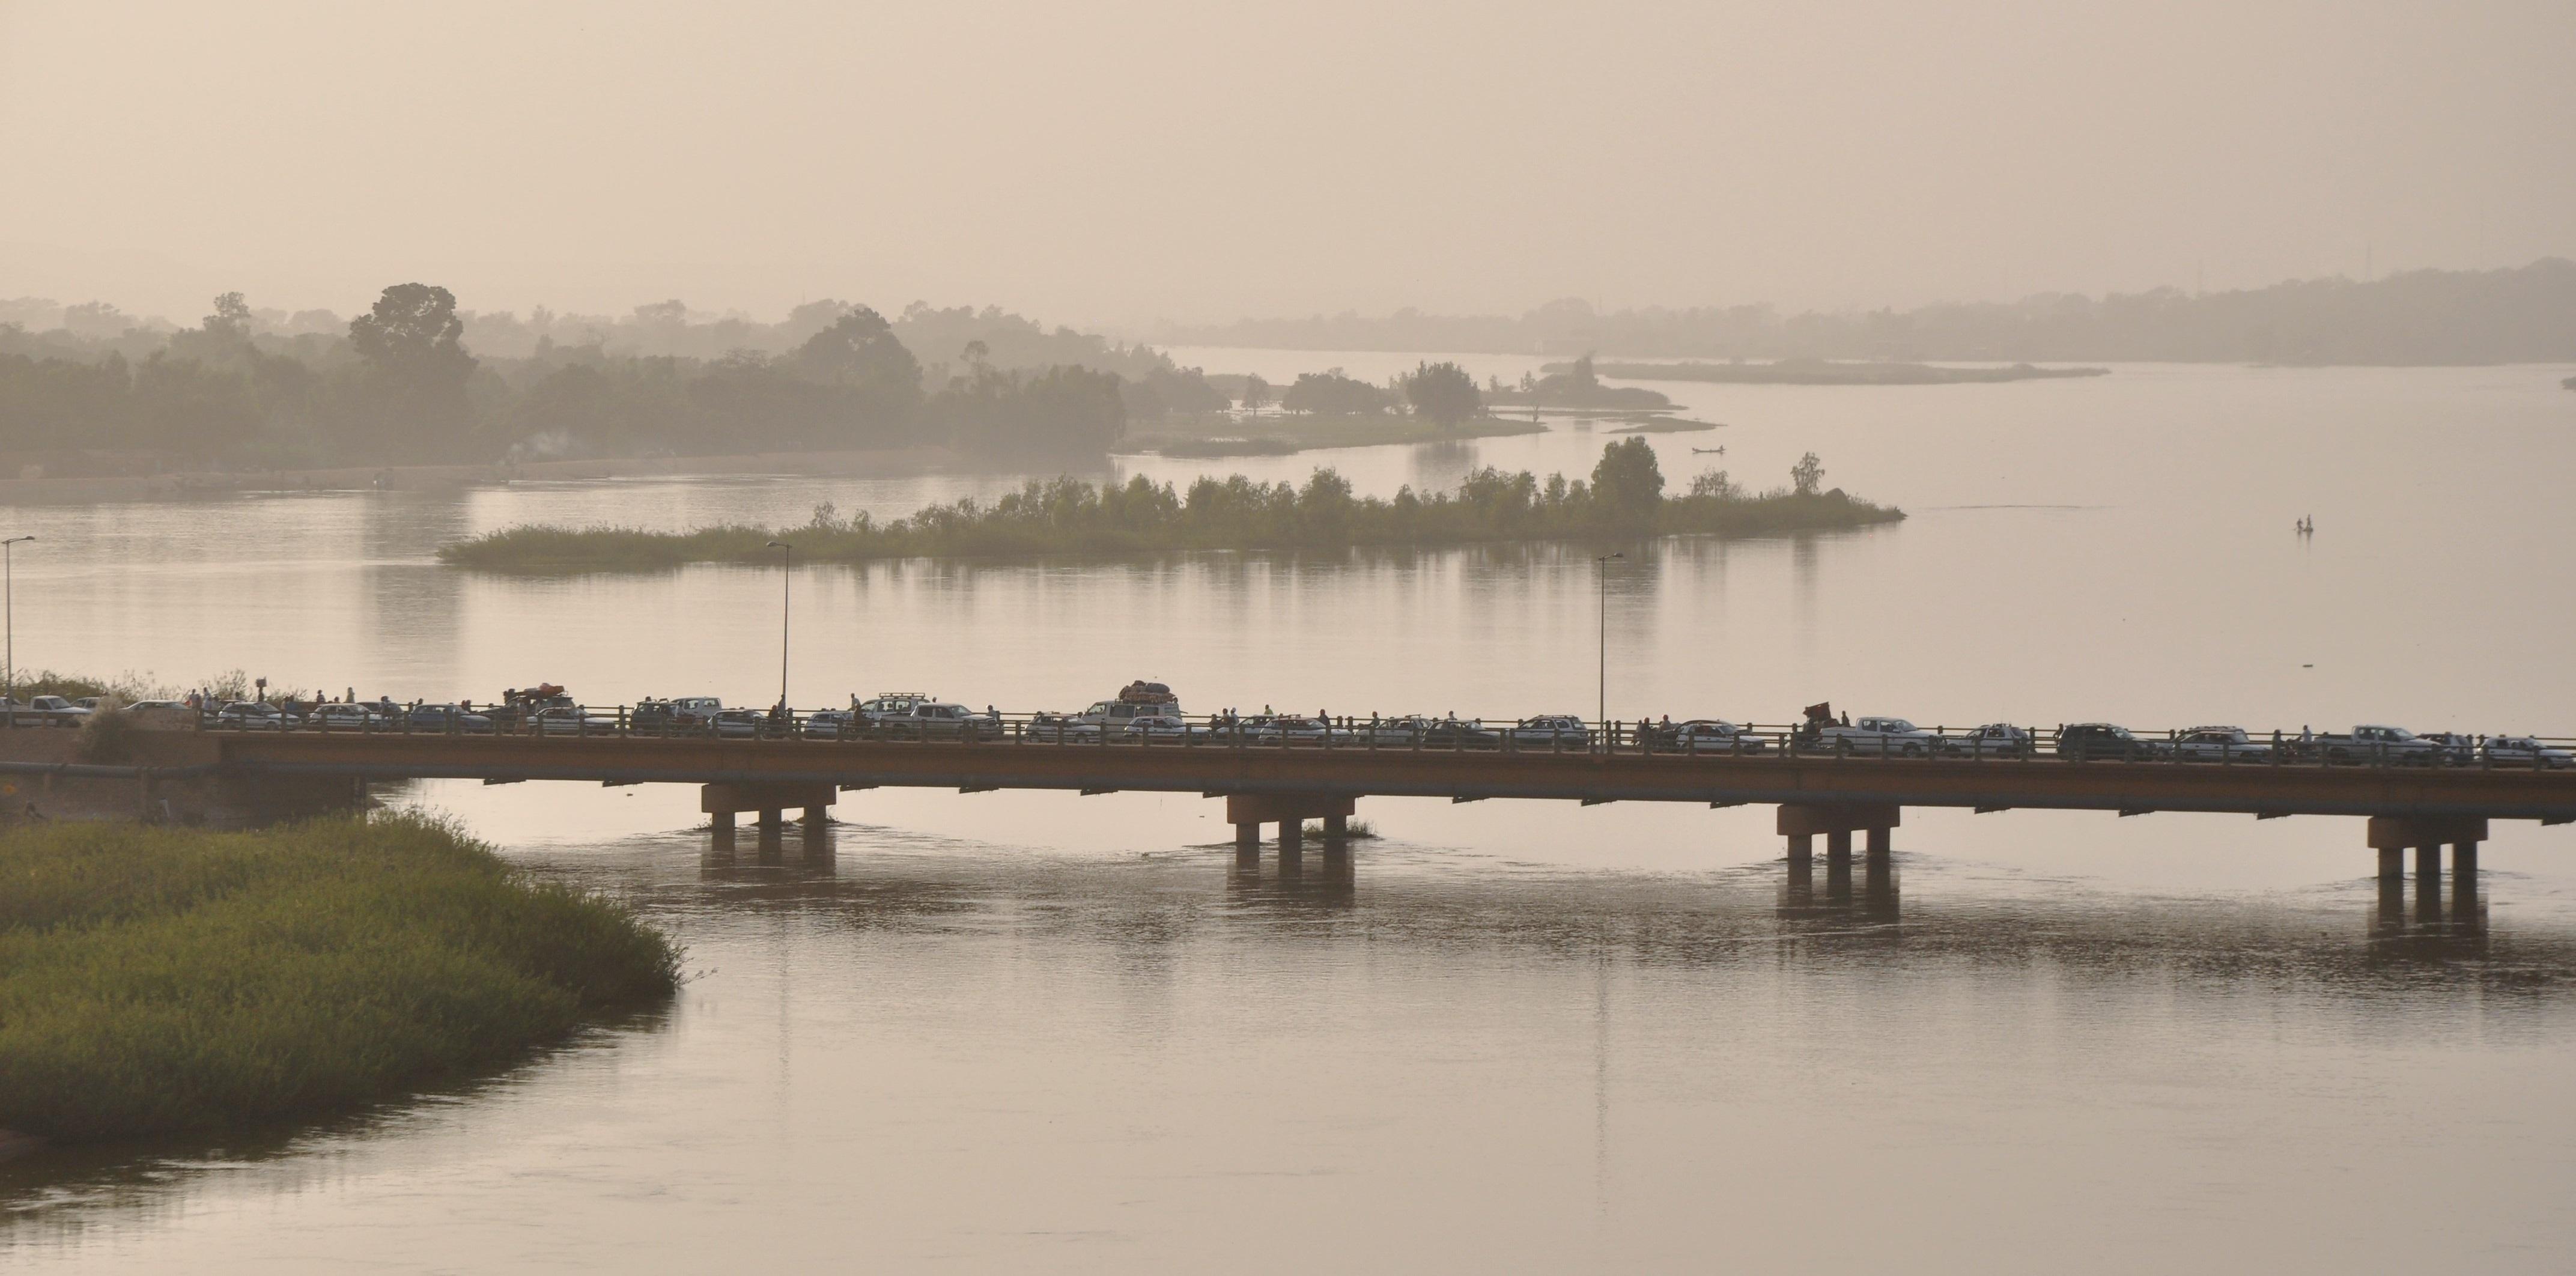 10. Niger River